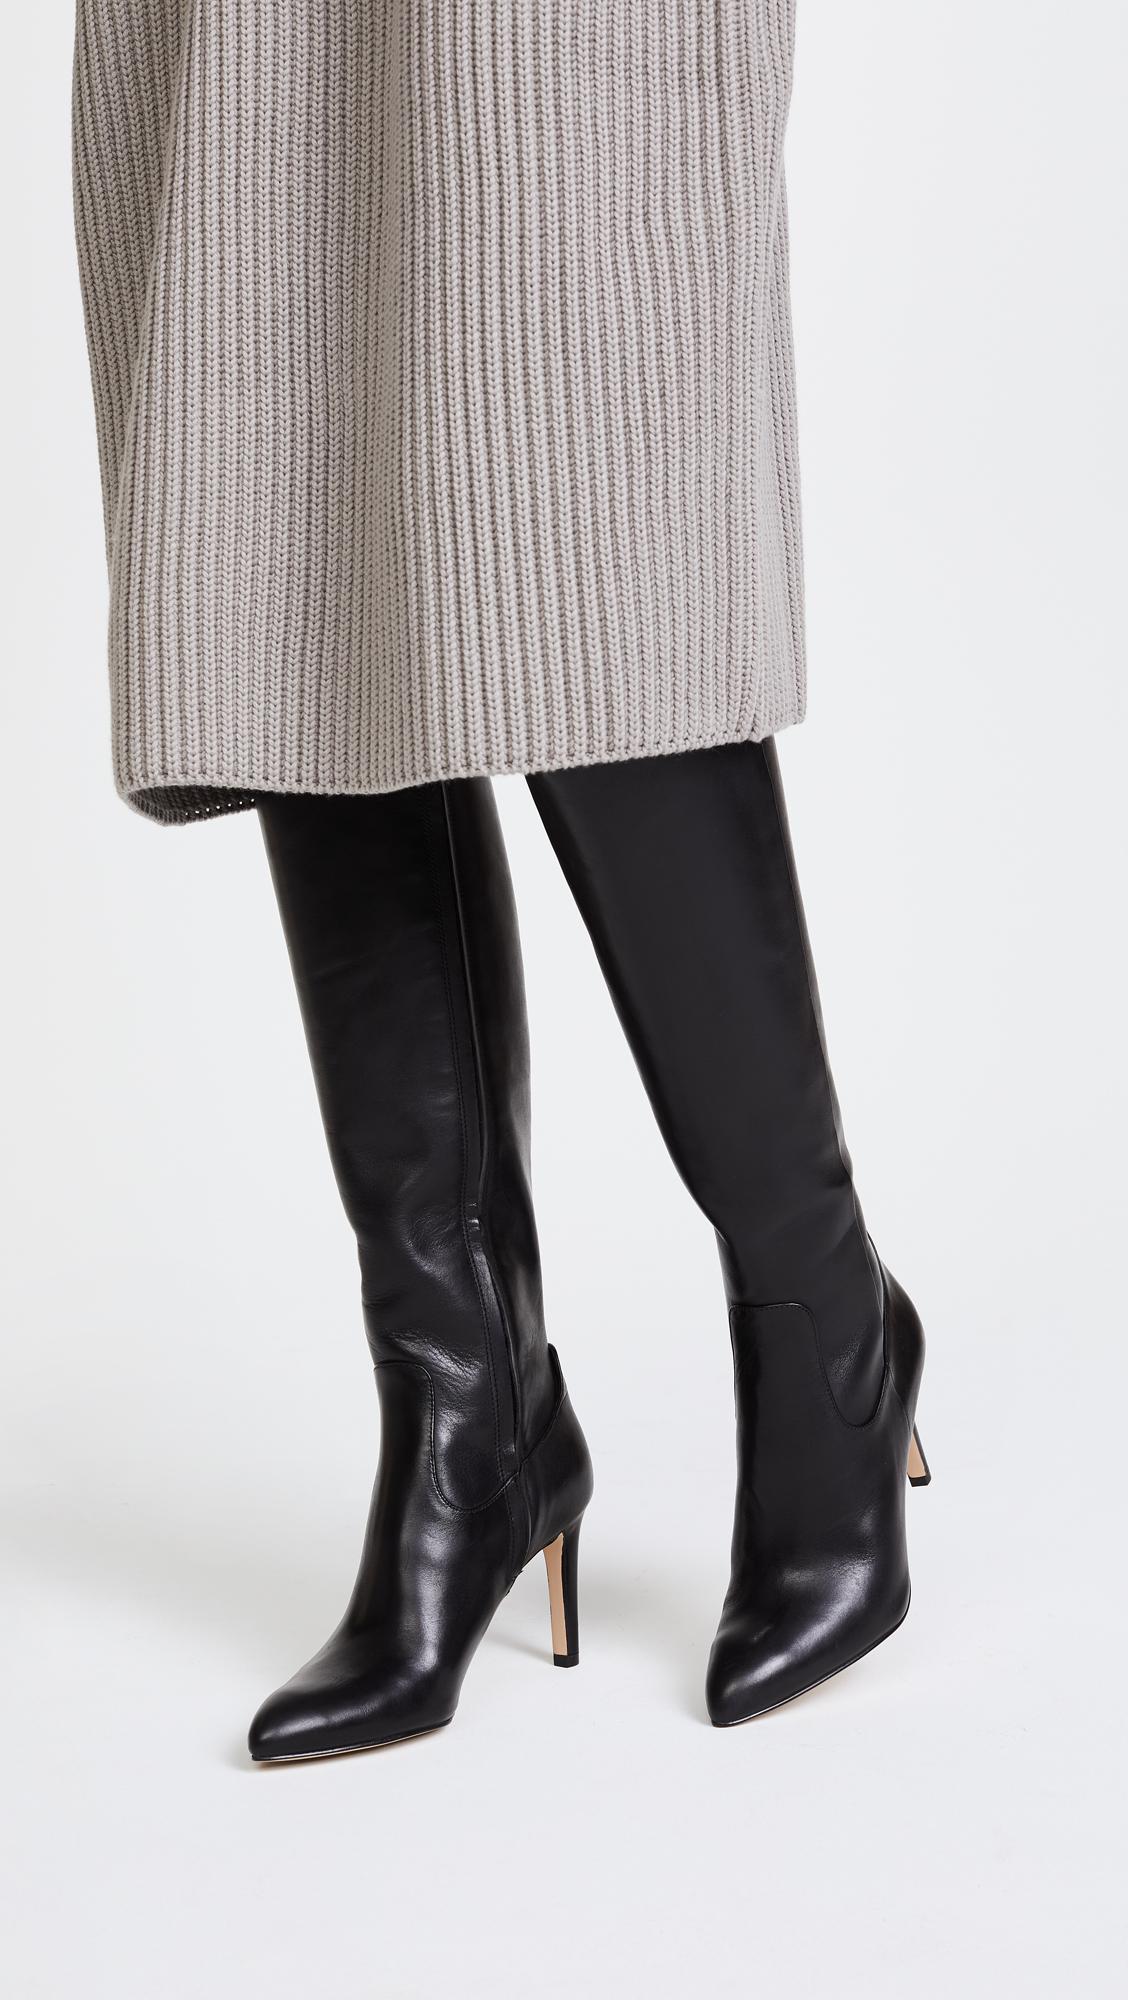 761ac252a35c Sam Edelman Olencia Tall Boots